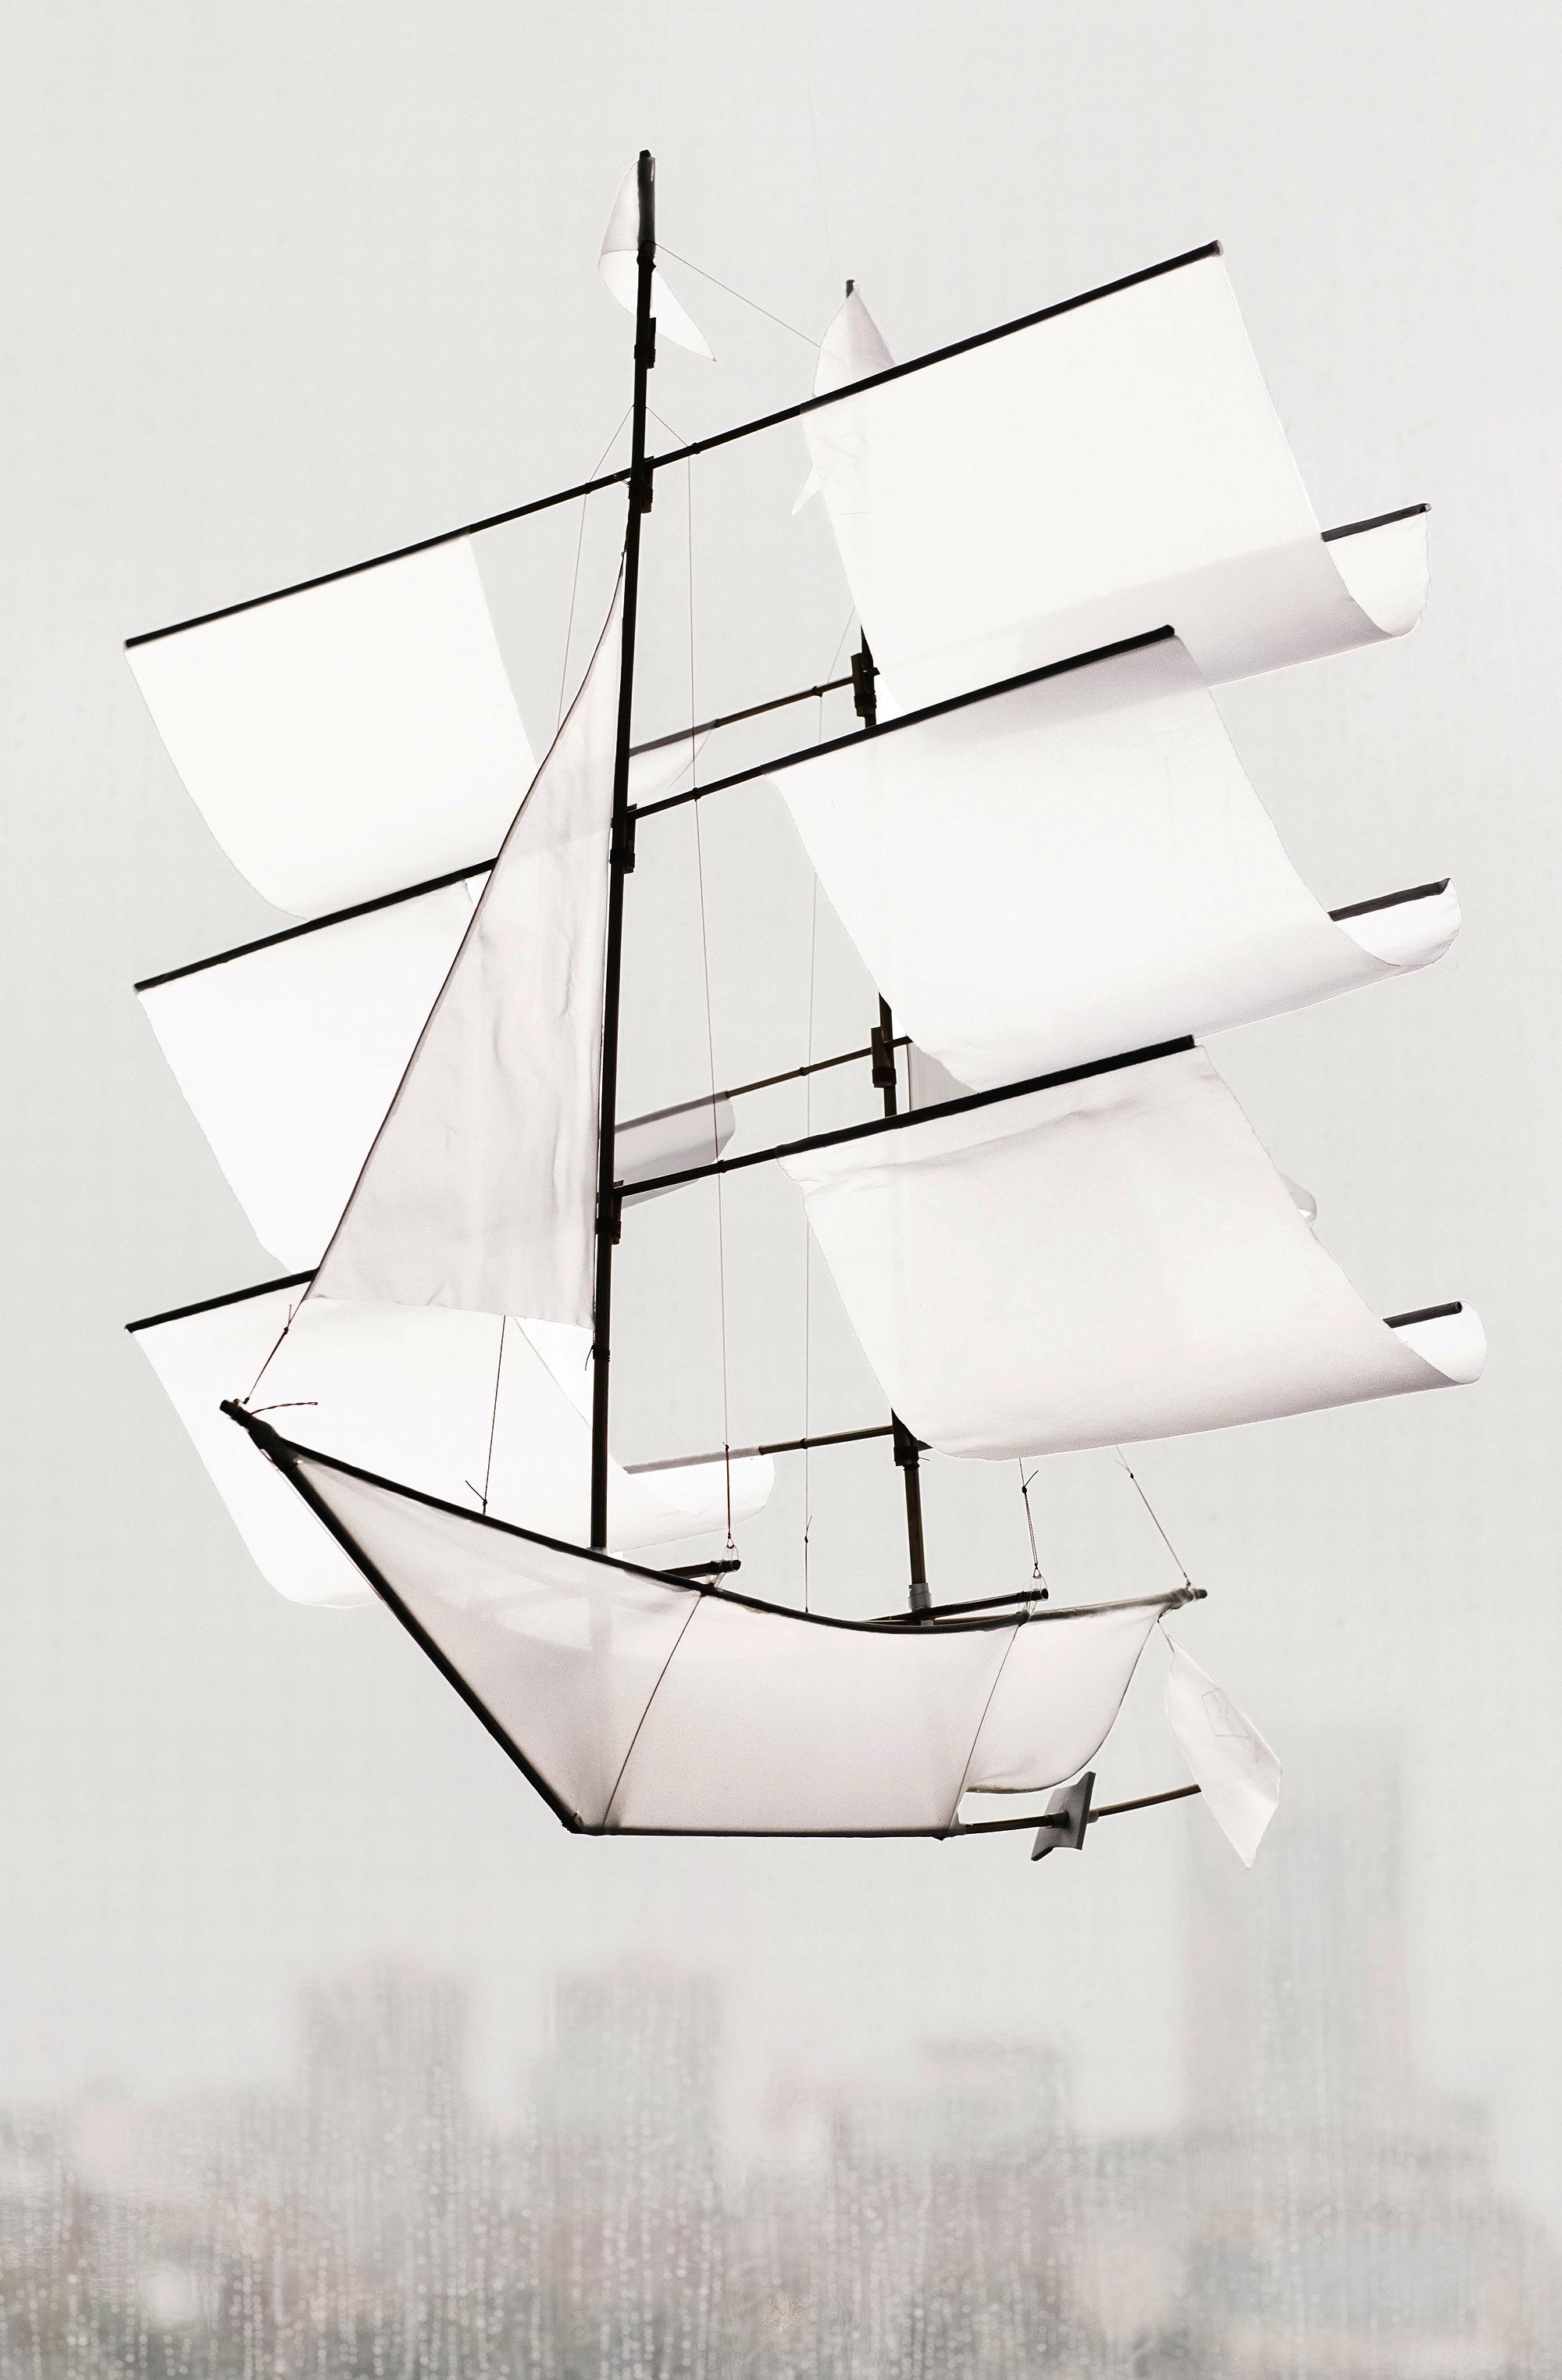 laura john wedding massachusetts sailboats